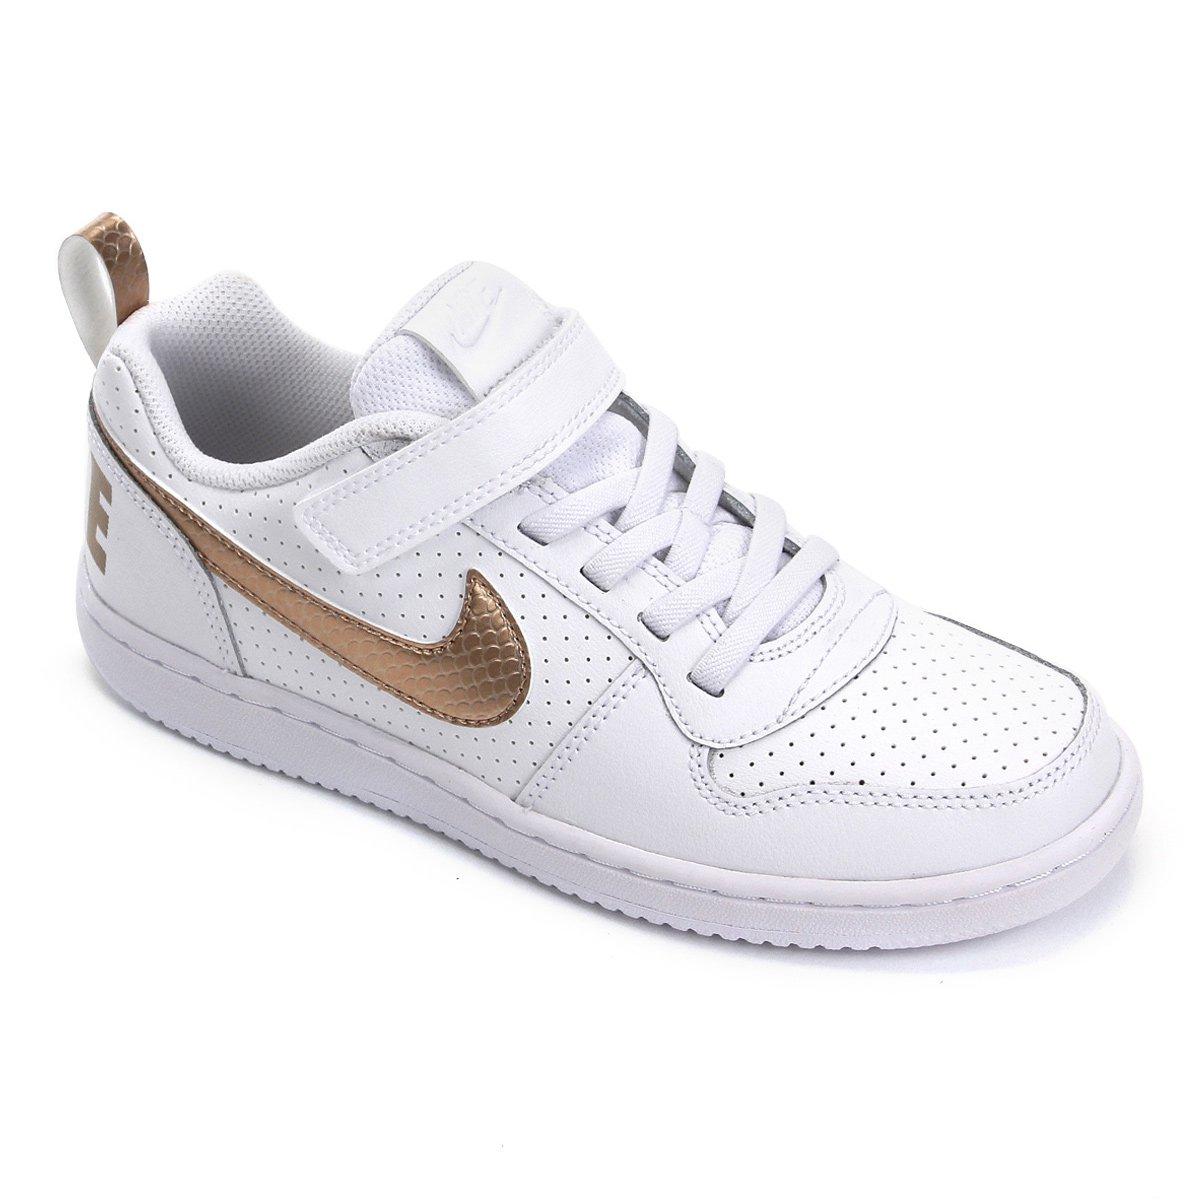 Tênis Couro Infantil Nike Court Borough Low Ep Psv Feminino Branco E Dourado